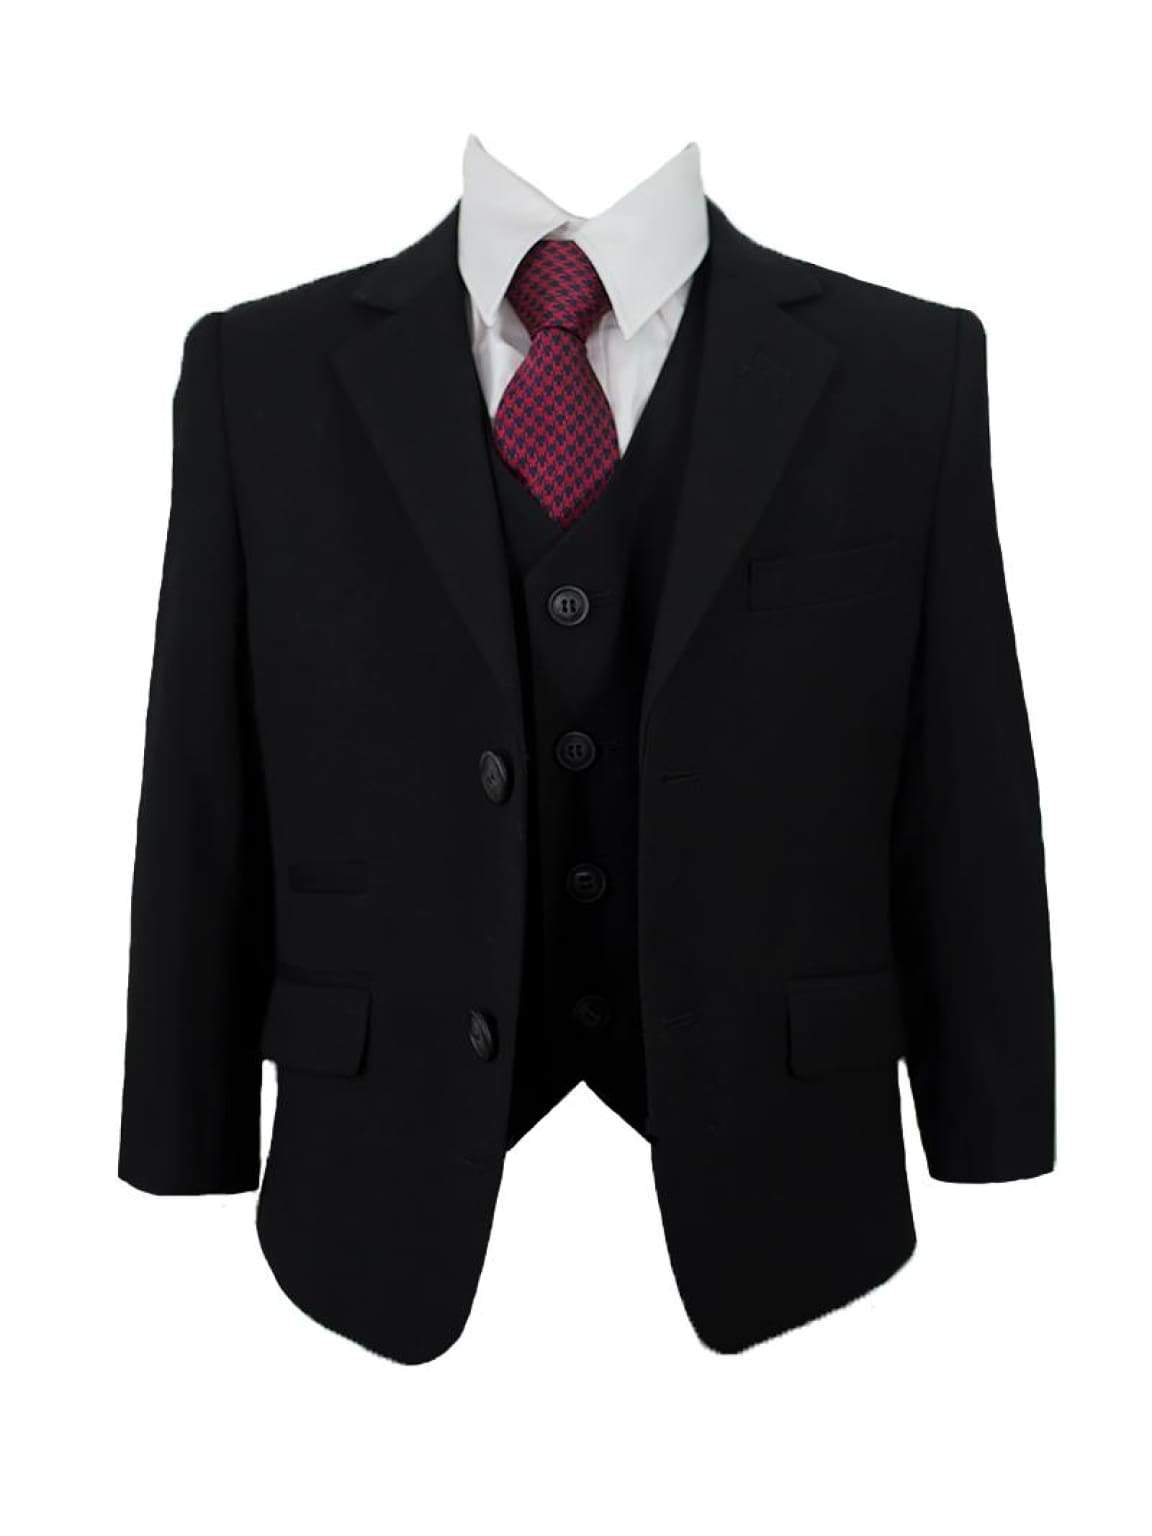 Cavani Marco Boys Three Piece Black Slim Fit Suit - Suit & Tailoring